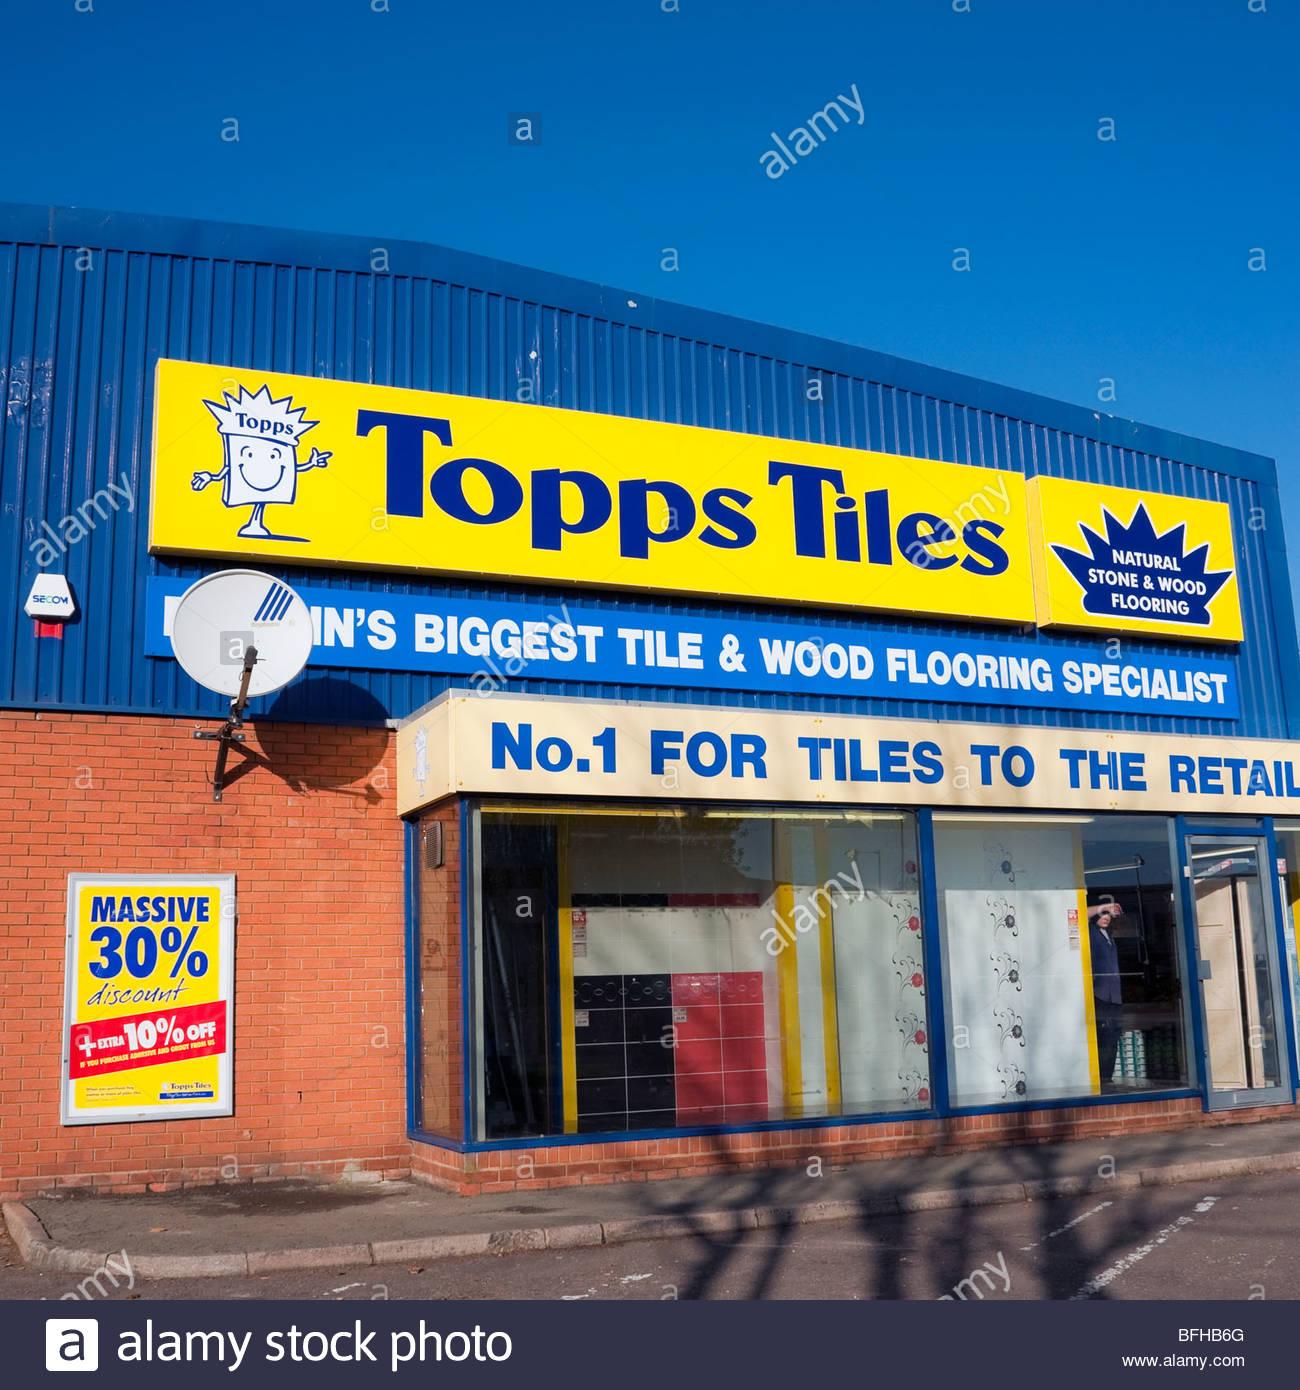 Topps Tiles Stock Photos & Topps Tiles Stock Images - Alamy